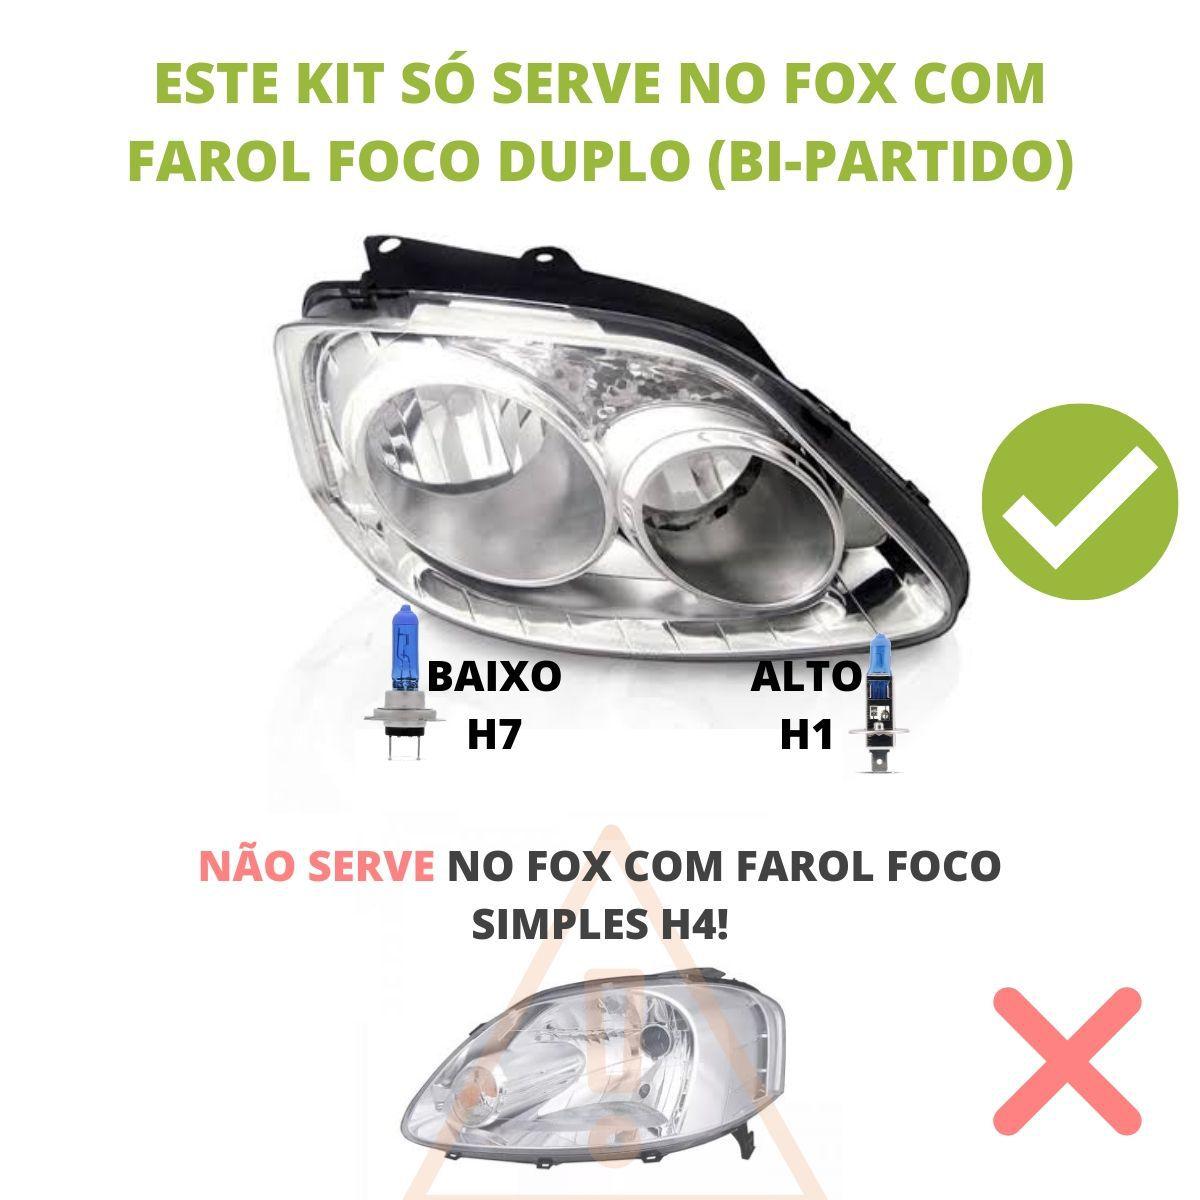 Kit Lampadas Fox 2003 2004 2005 2006 2007 2008 2009 Super Brancas Farol Duplo H7 H1 Milha H3 - Techone 8500k 55w Inmetro